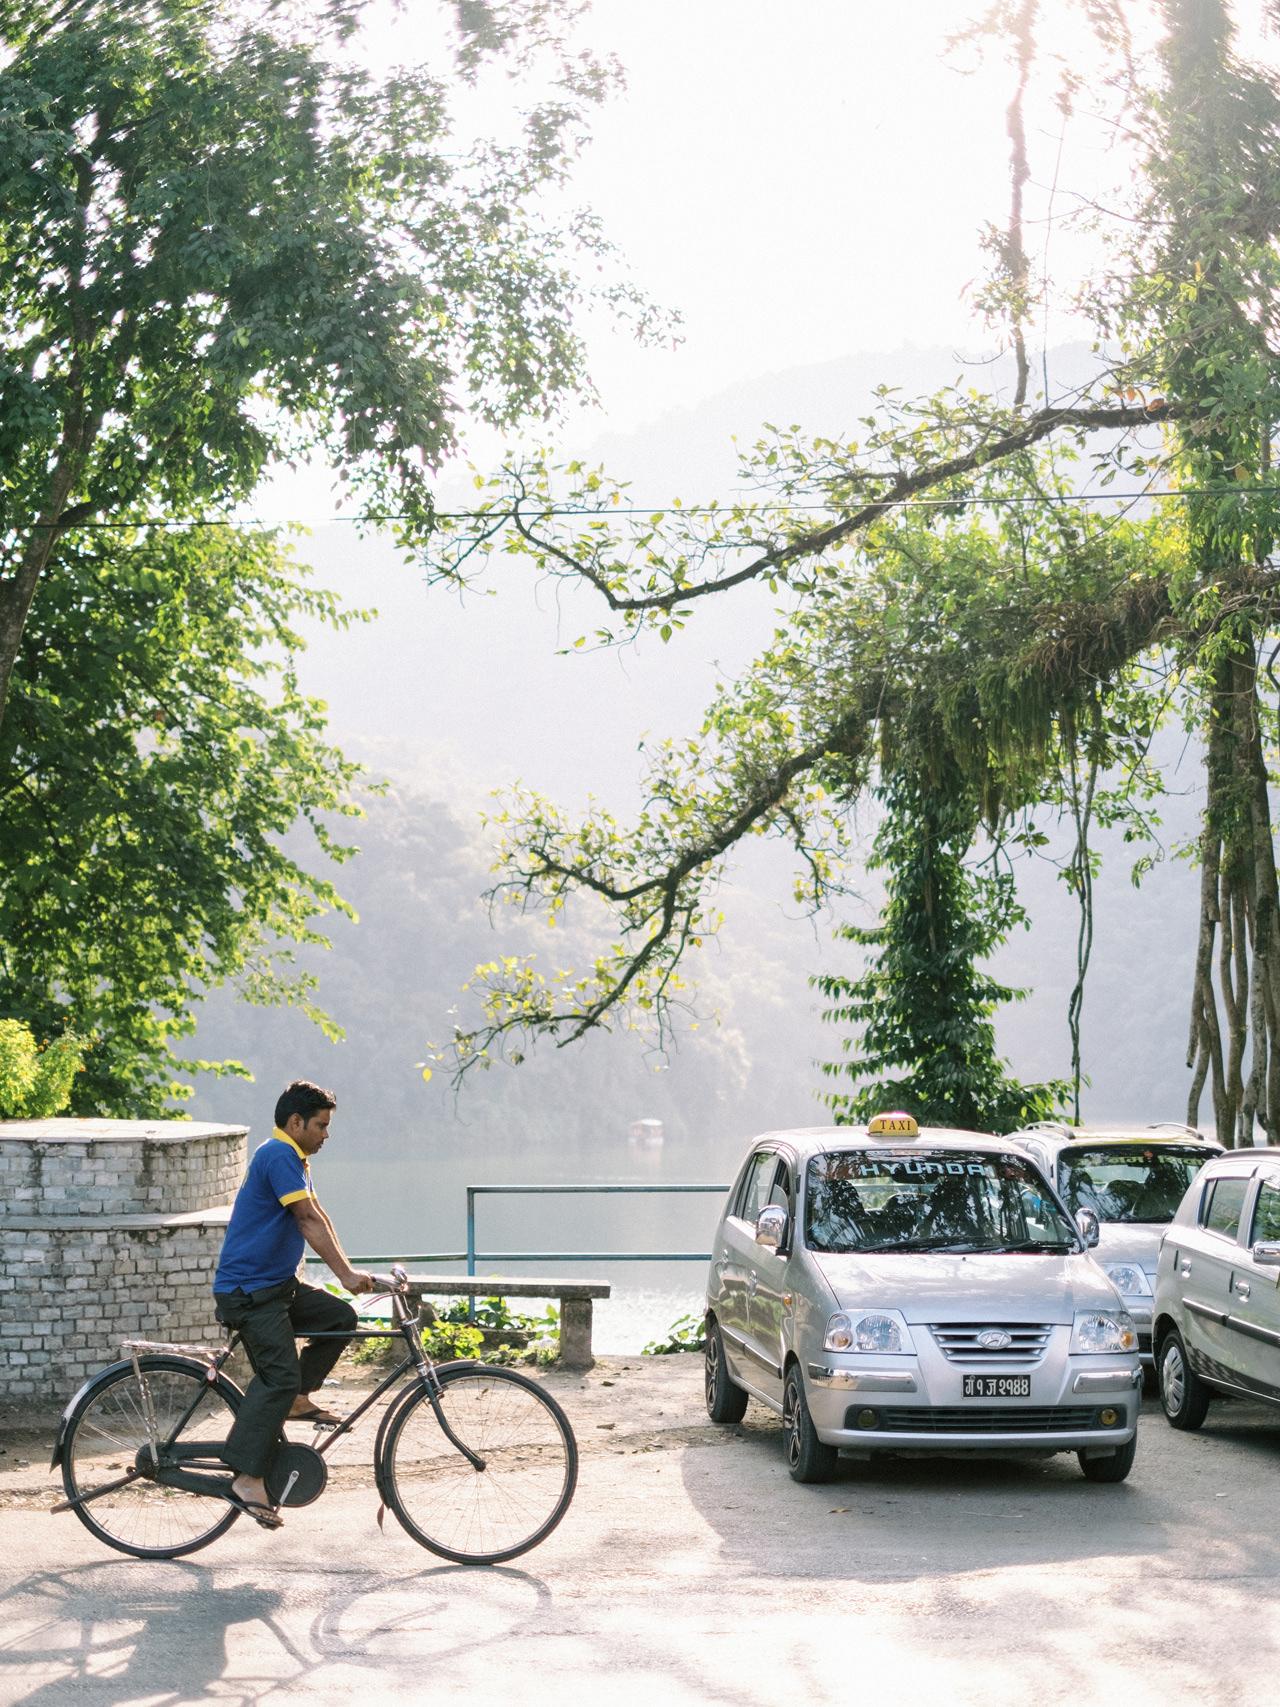 Nepal 2019 - Trekking Annapurna Base Camp 31